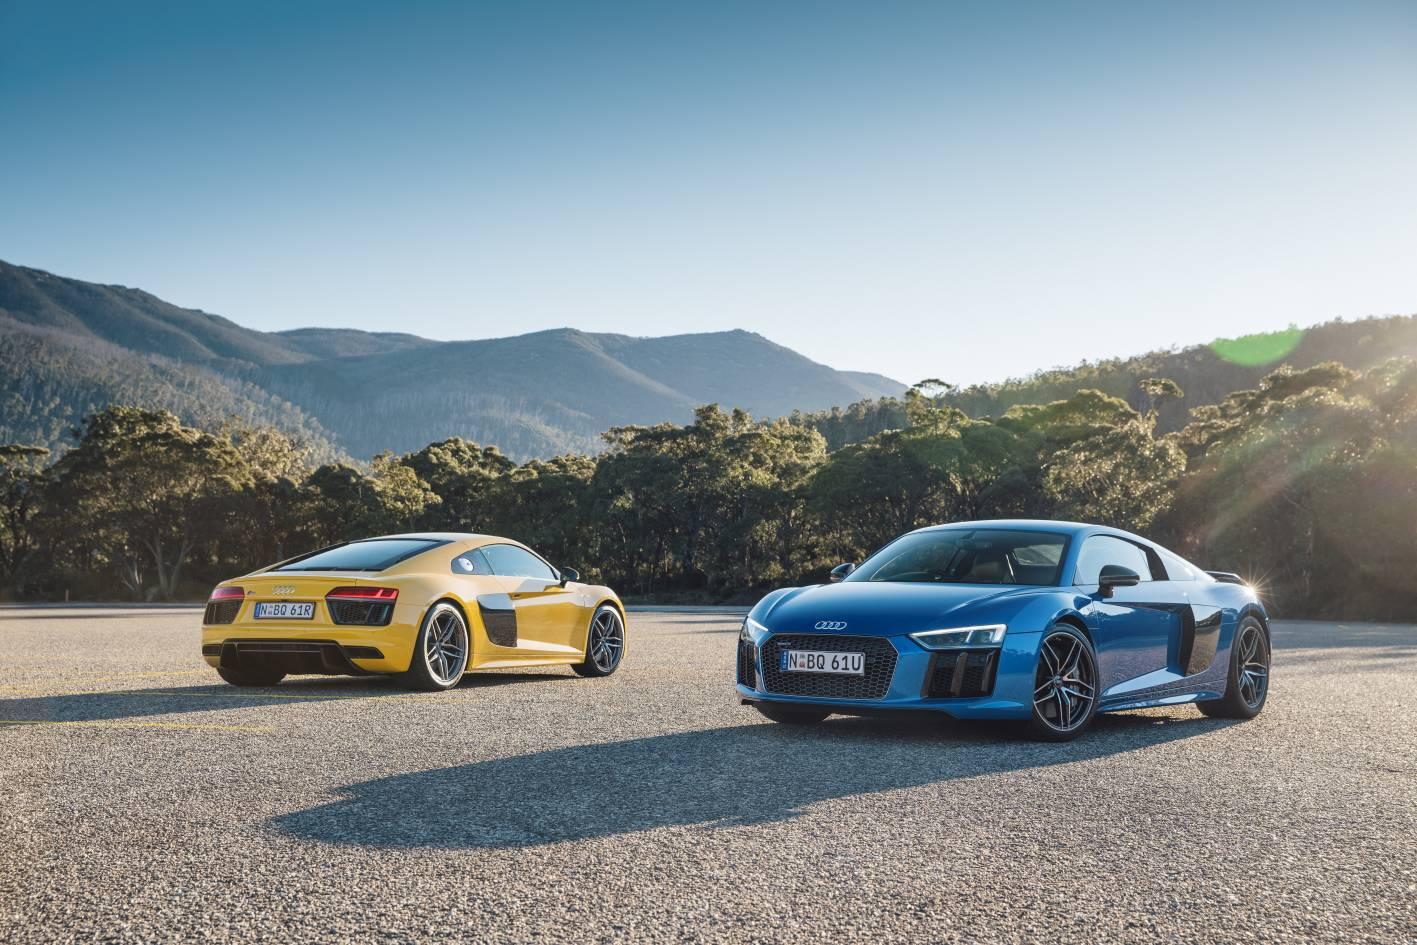 2016 audi r8 v10 and v10 plus coupe arrives in australia